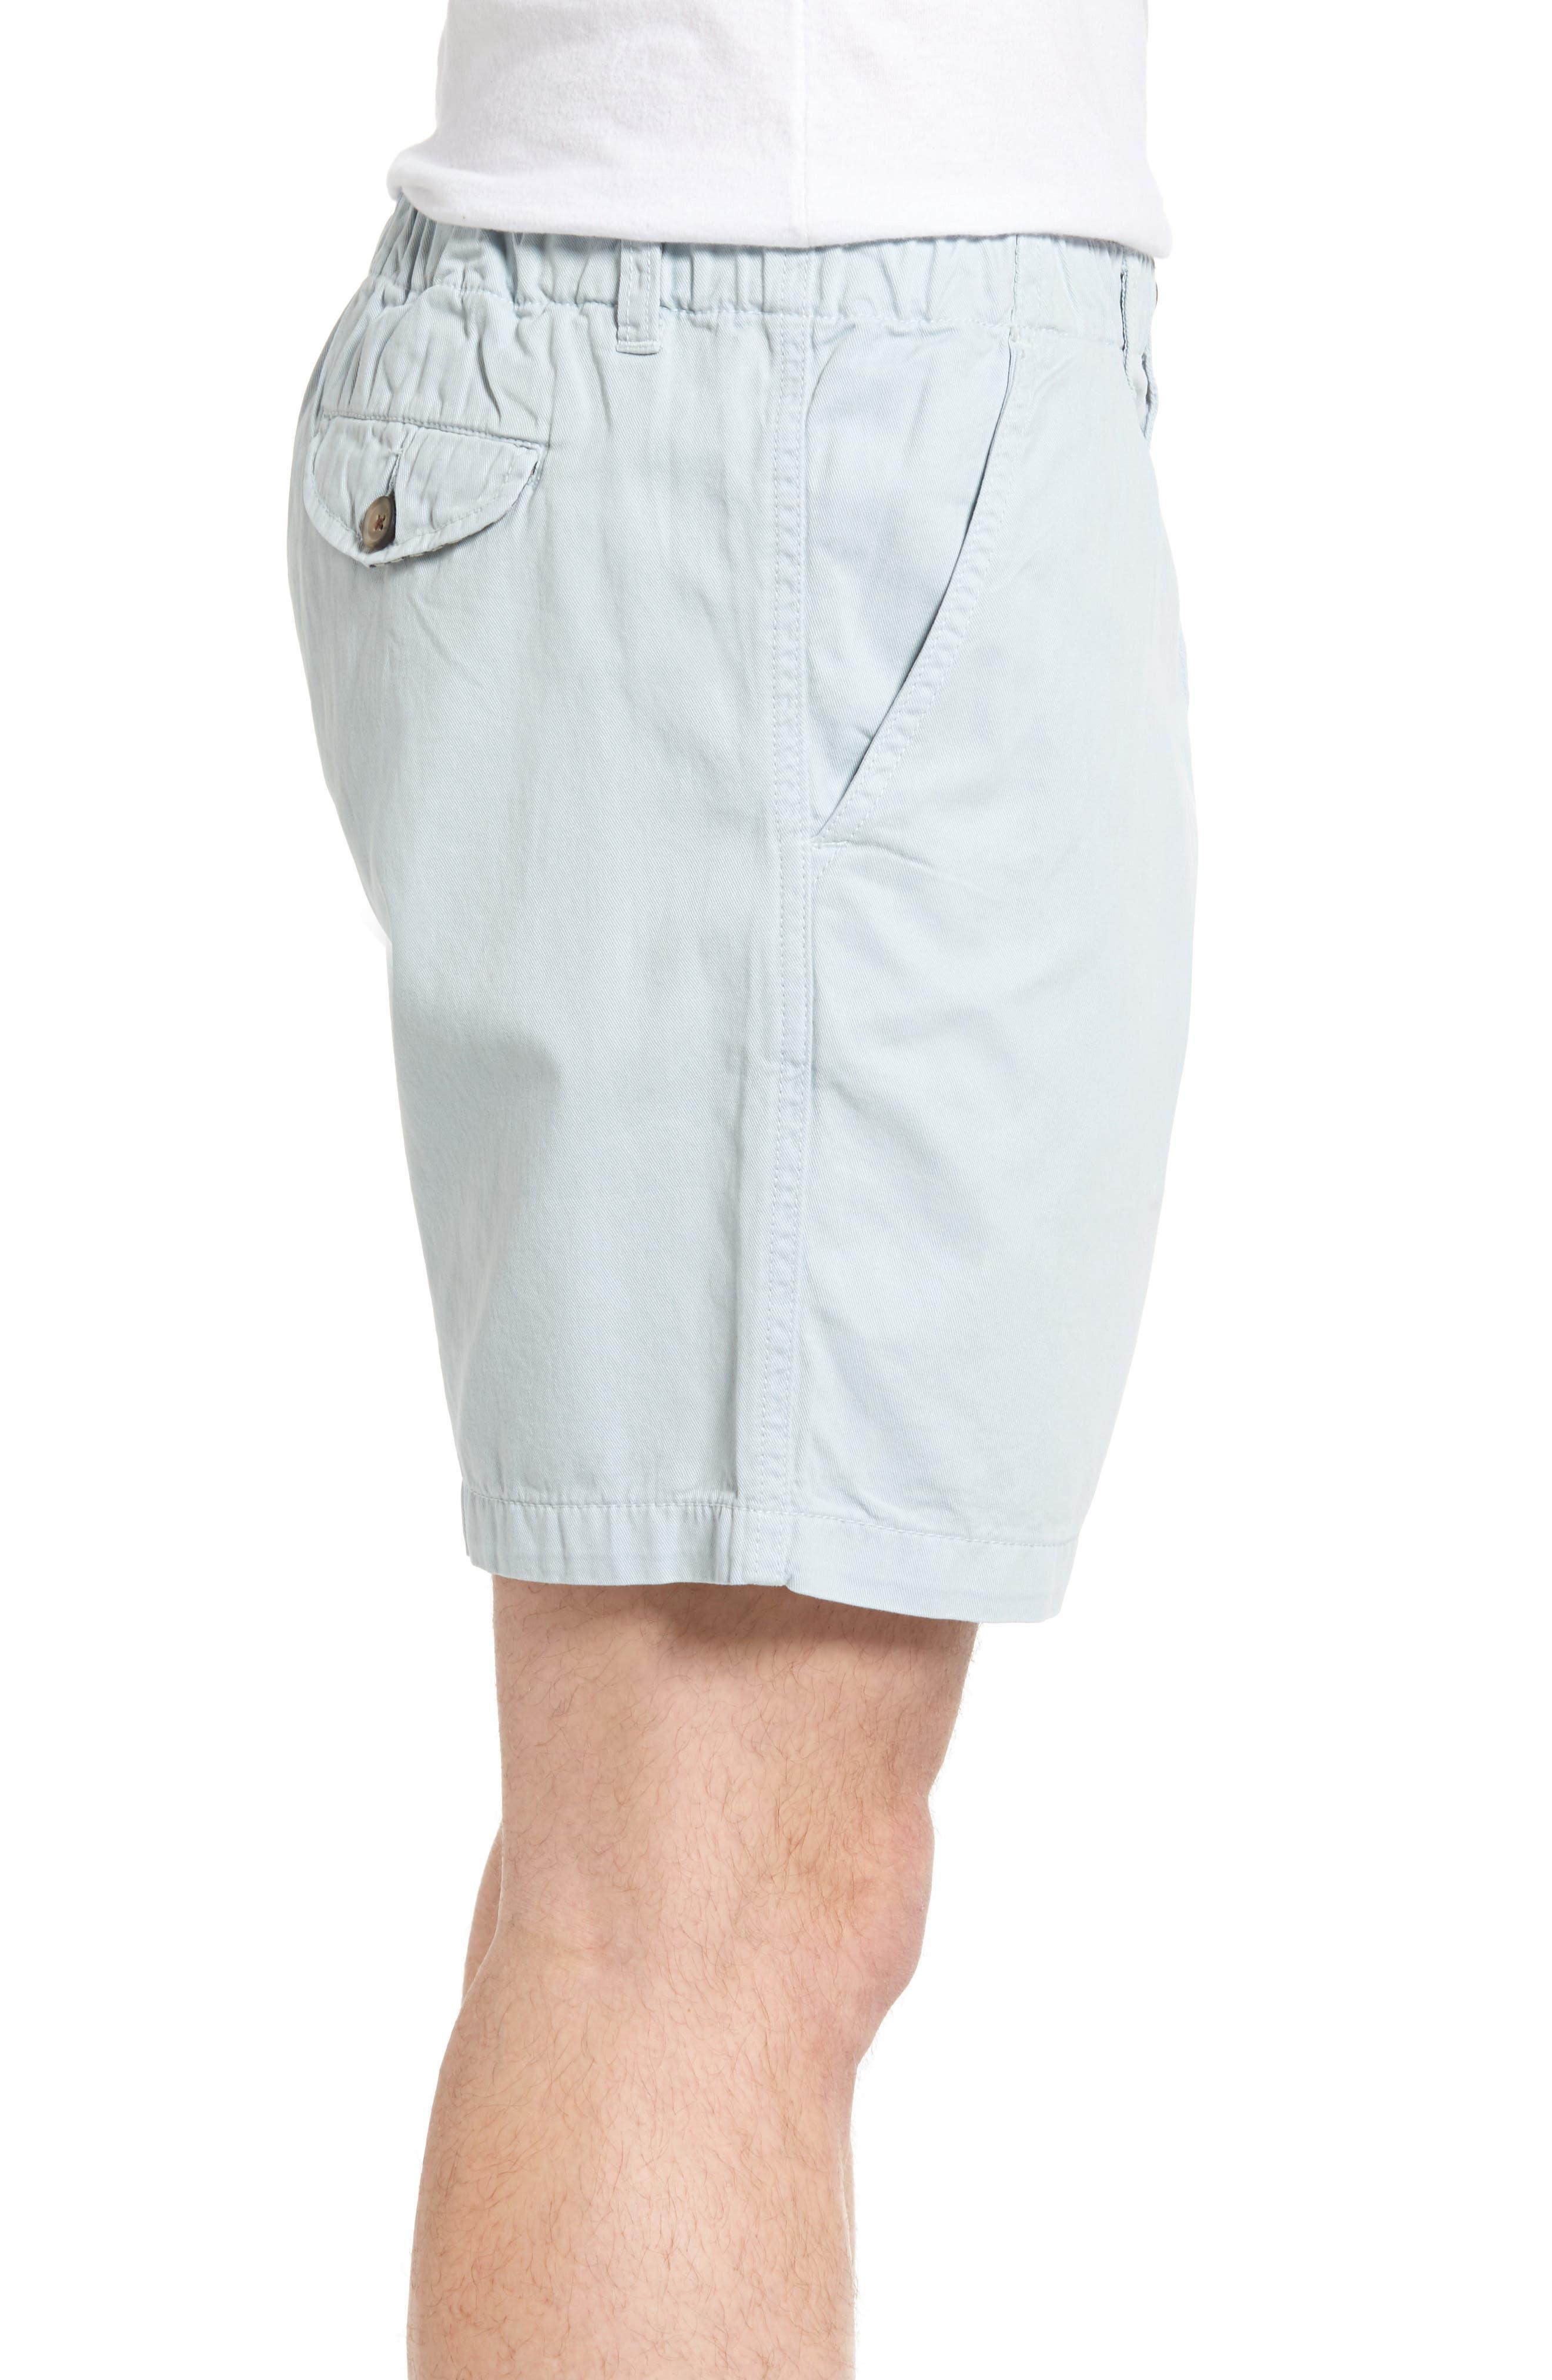 Washed Shorts,                             Alternate thumbnail 3, color,                             Sky